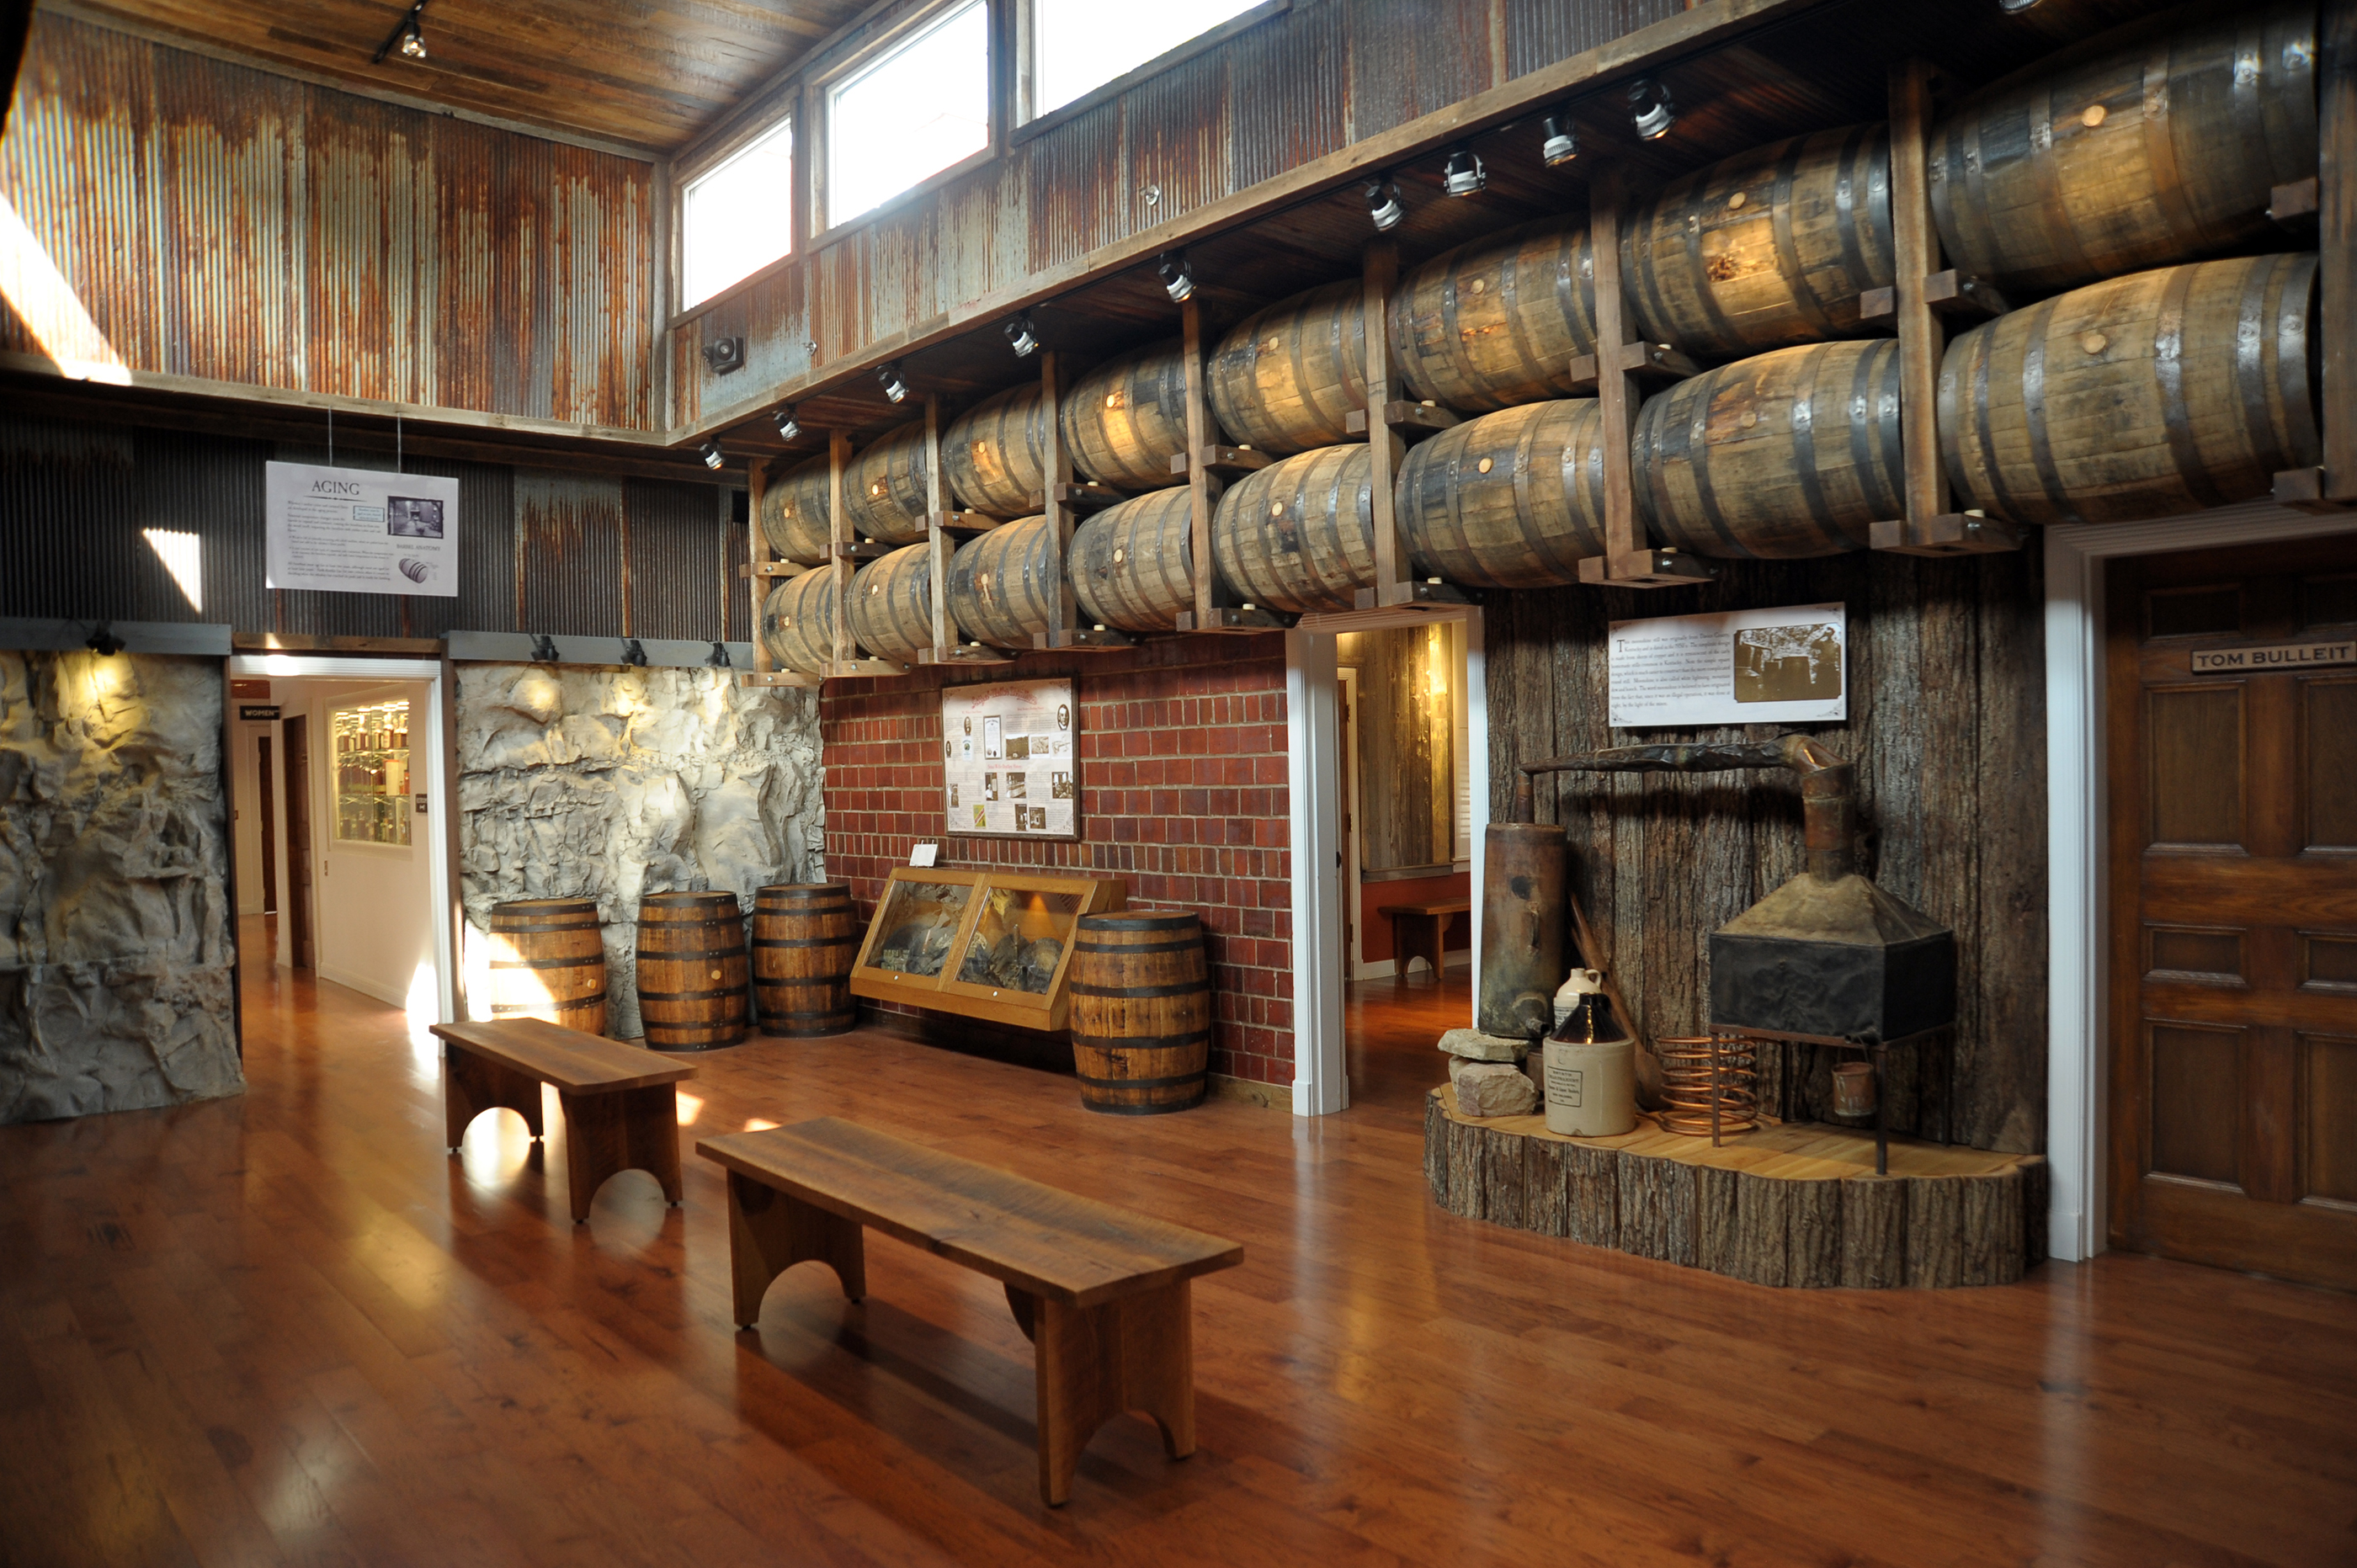 170913-BPL-drinking-cities-louisville-rickhouse-exhibition-stitzel-weller